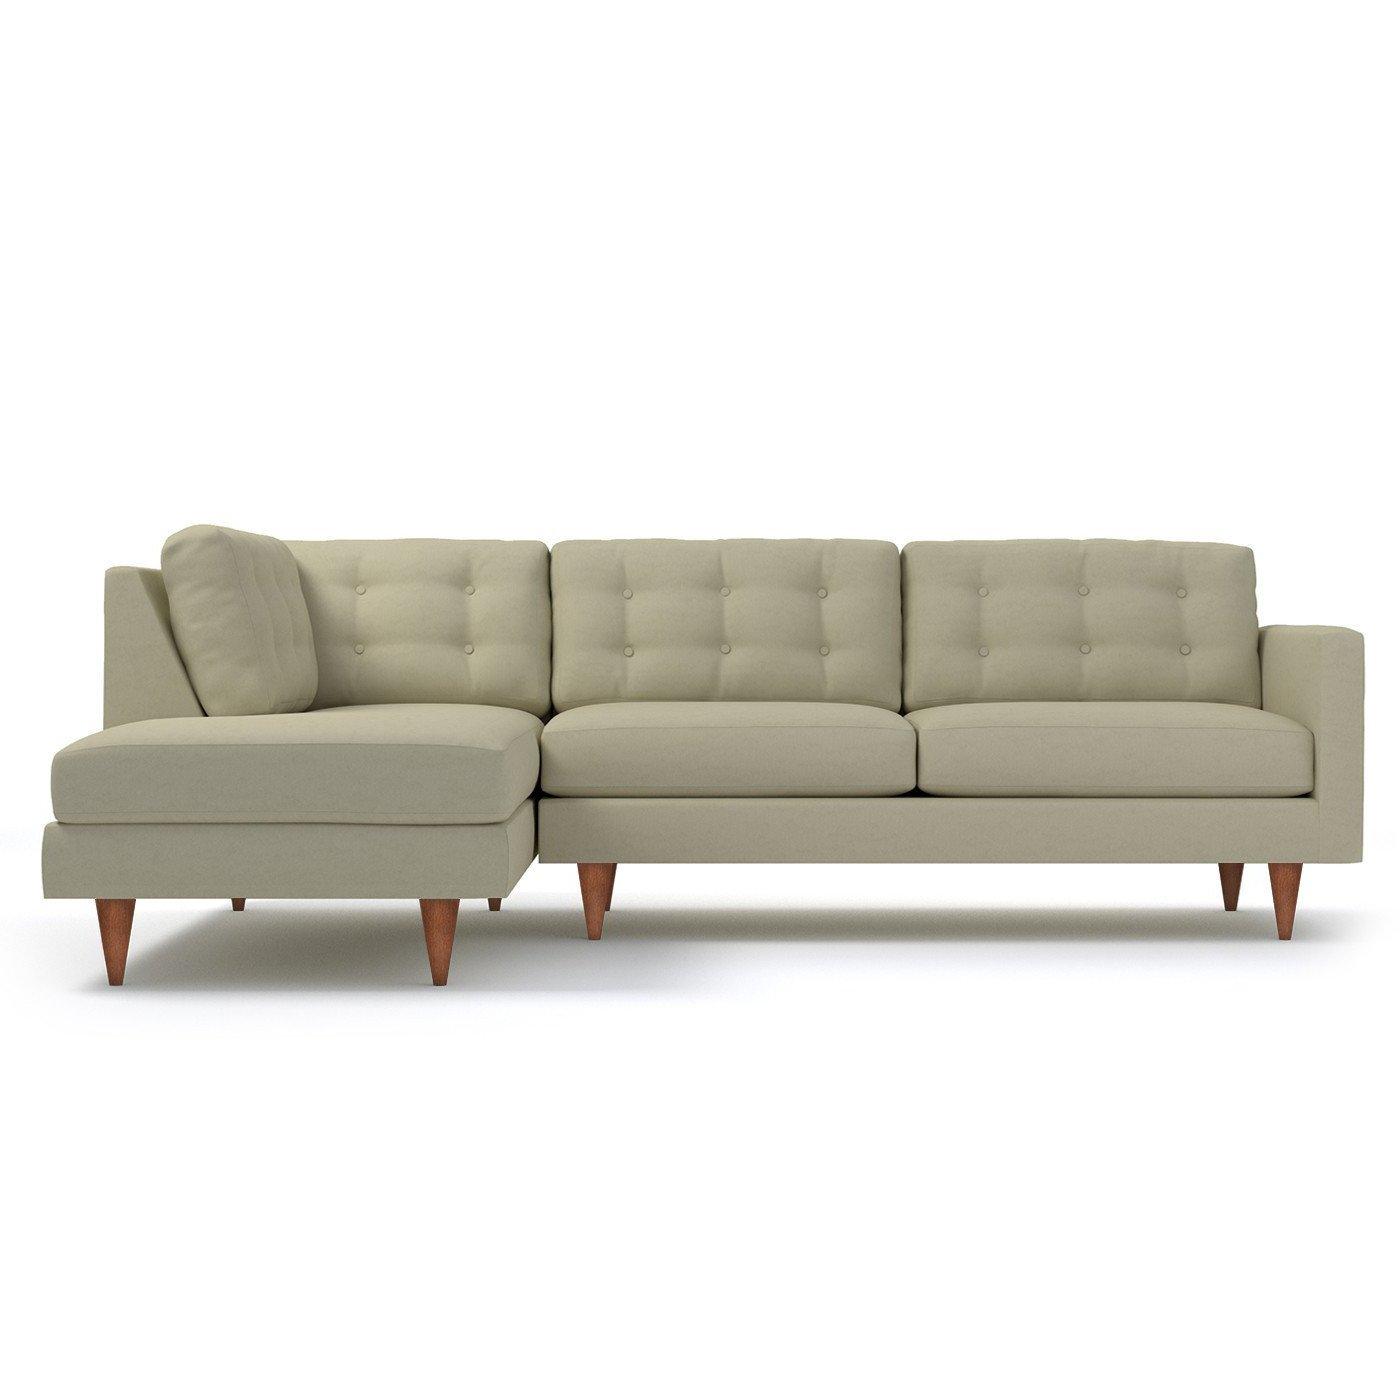 Pleasant Amazon Com Apt2B Logan 2Pc Sectional Sofa Laf Left Arm Machost Co Dining Chair Design Ideas Machostcouk